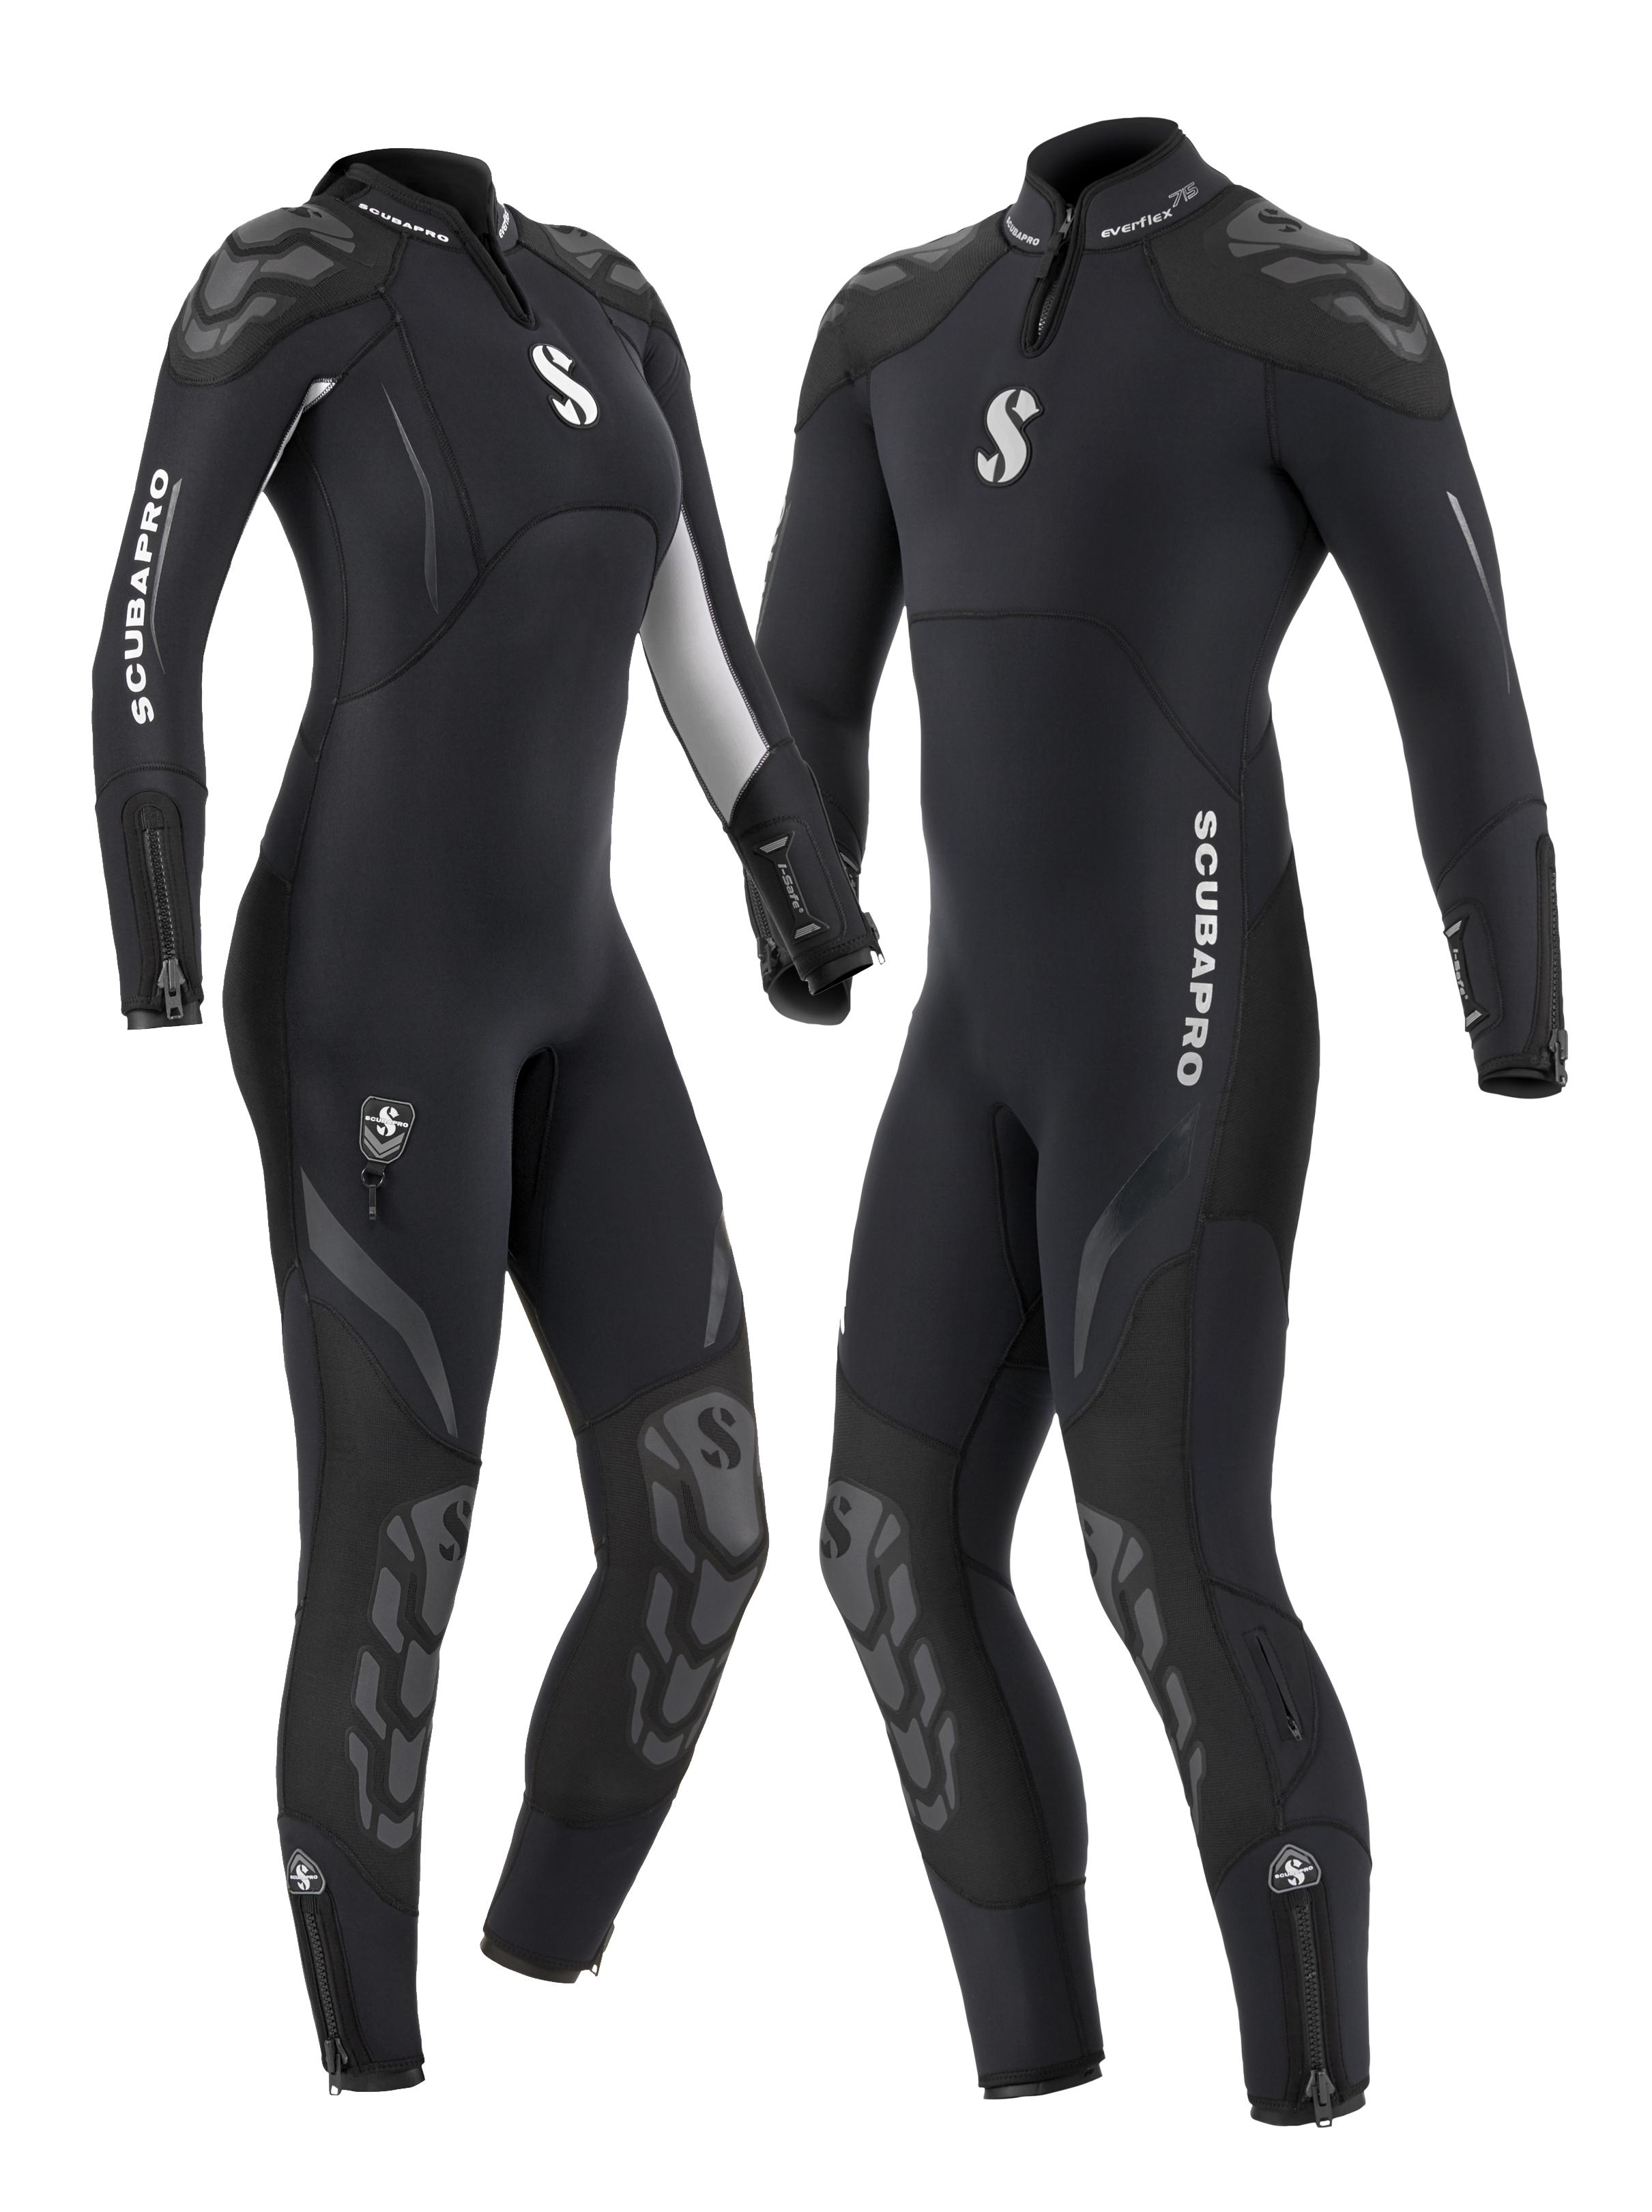 Мъжки водолазен костюм EVERFLEX Man 5/4 мм - Scubapro